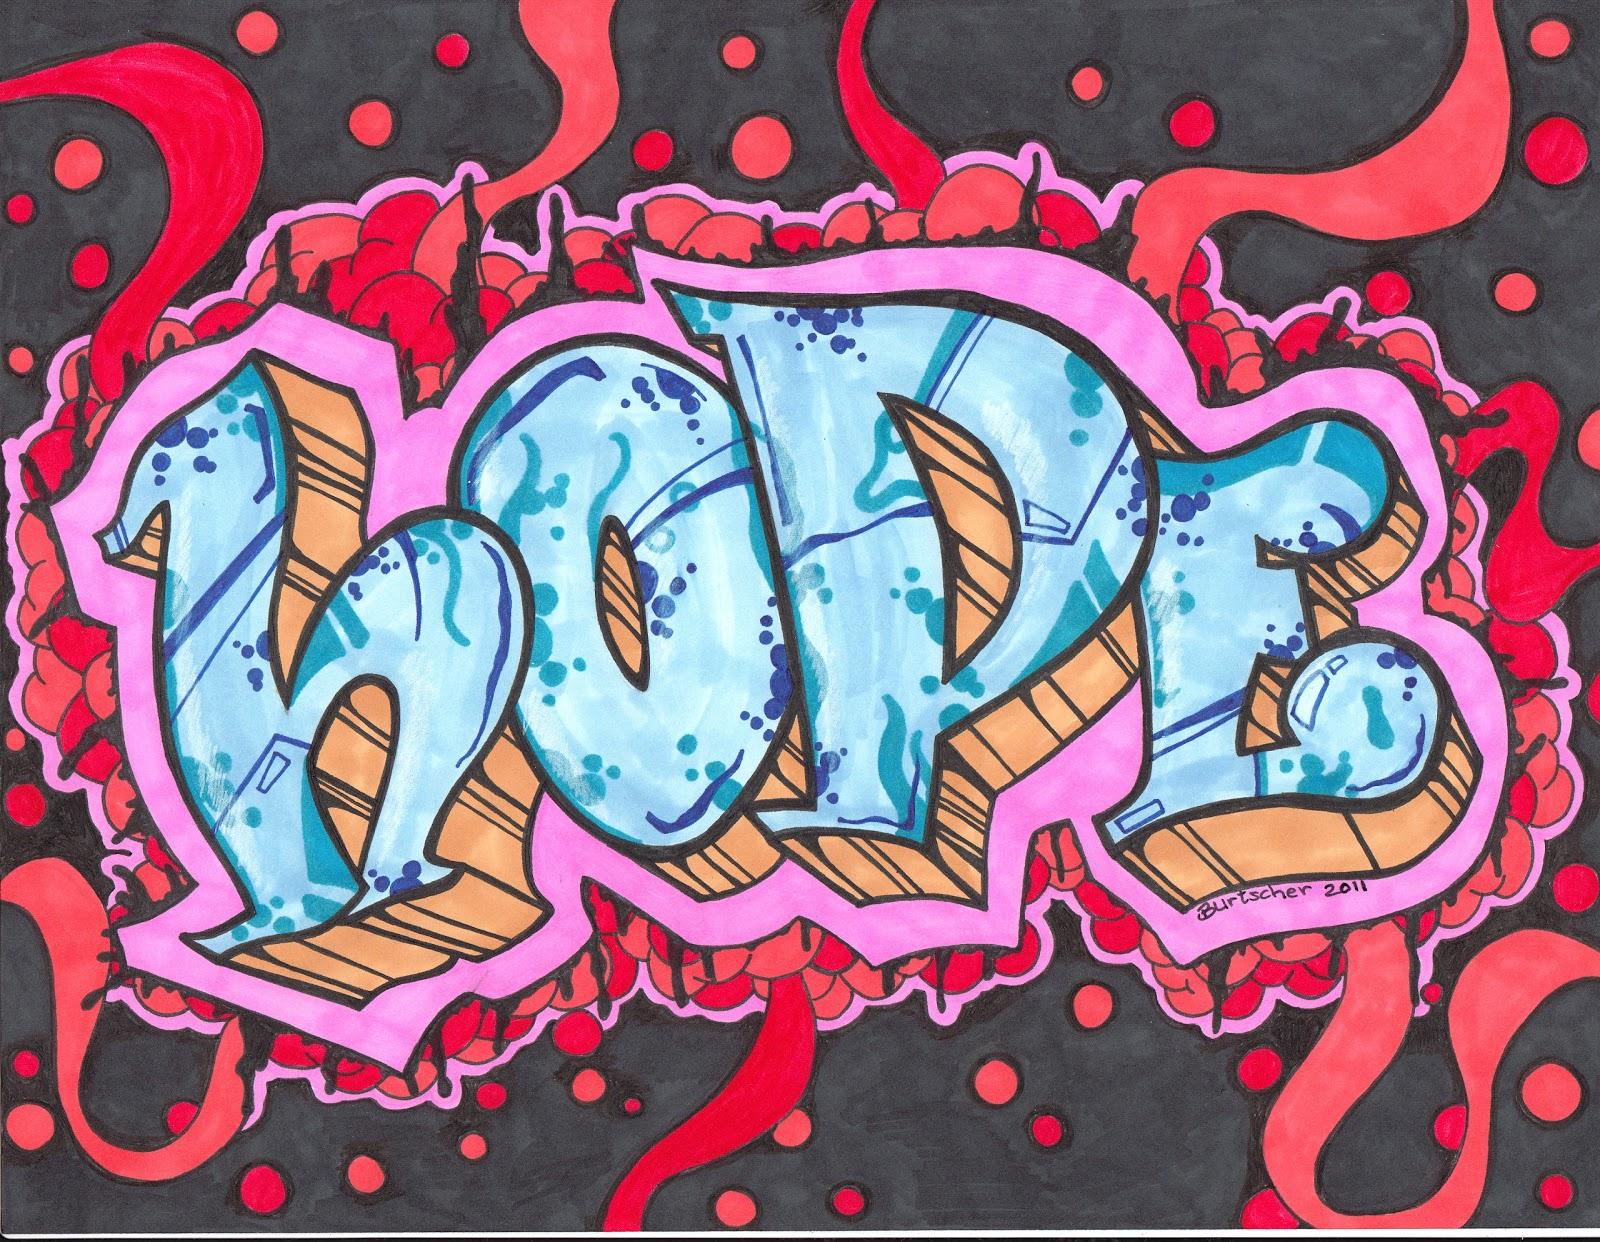 Name Art: The Creative Spirit: Graffiti Challenge #55